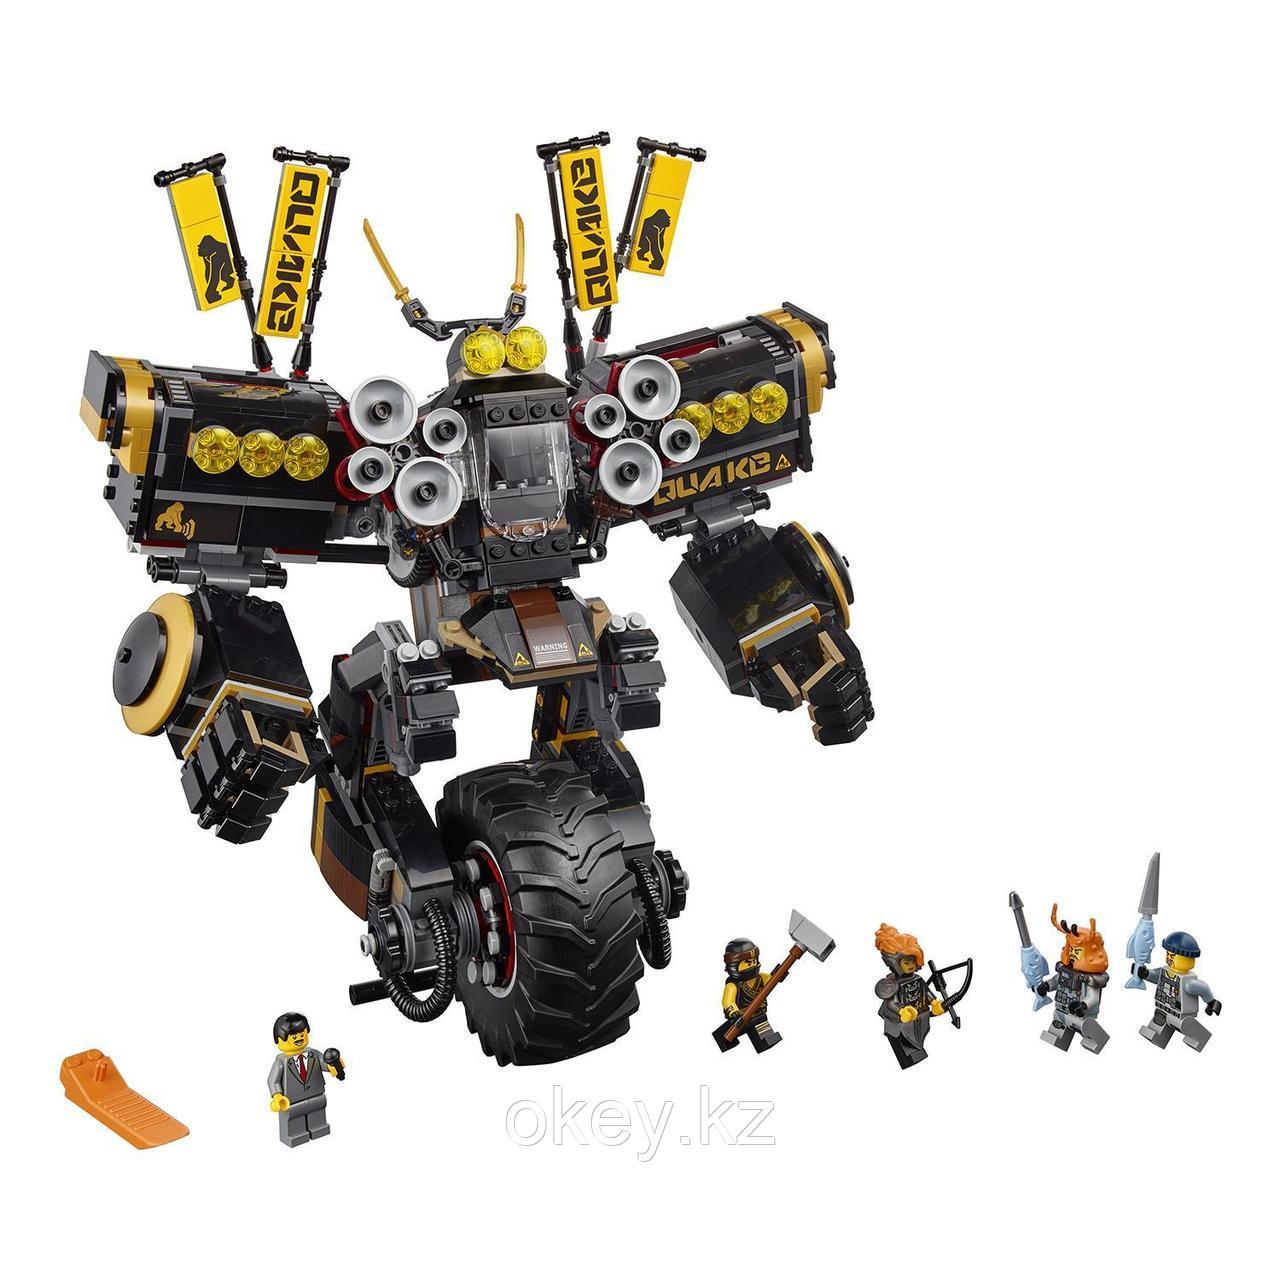 LEGO Ninjago Movie: Робот землетрясений 70632 - фото 3